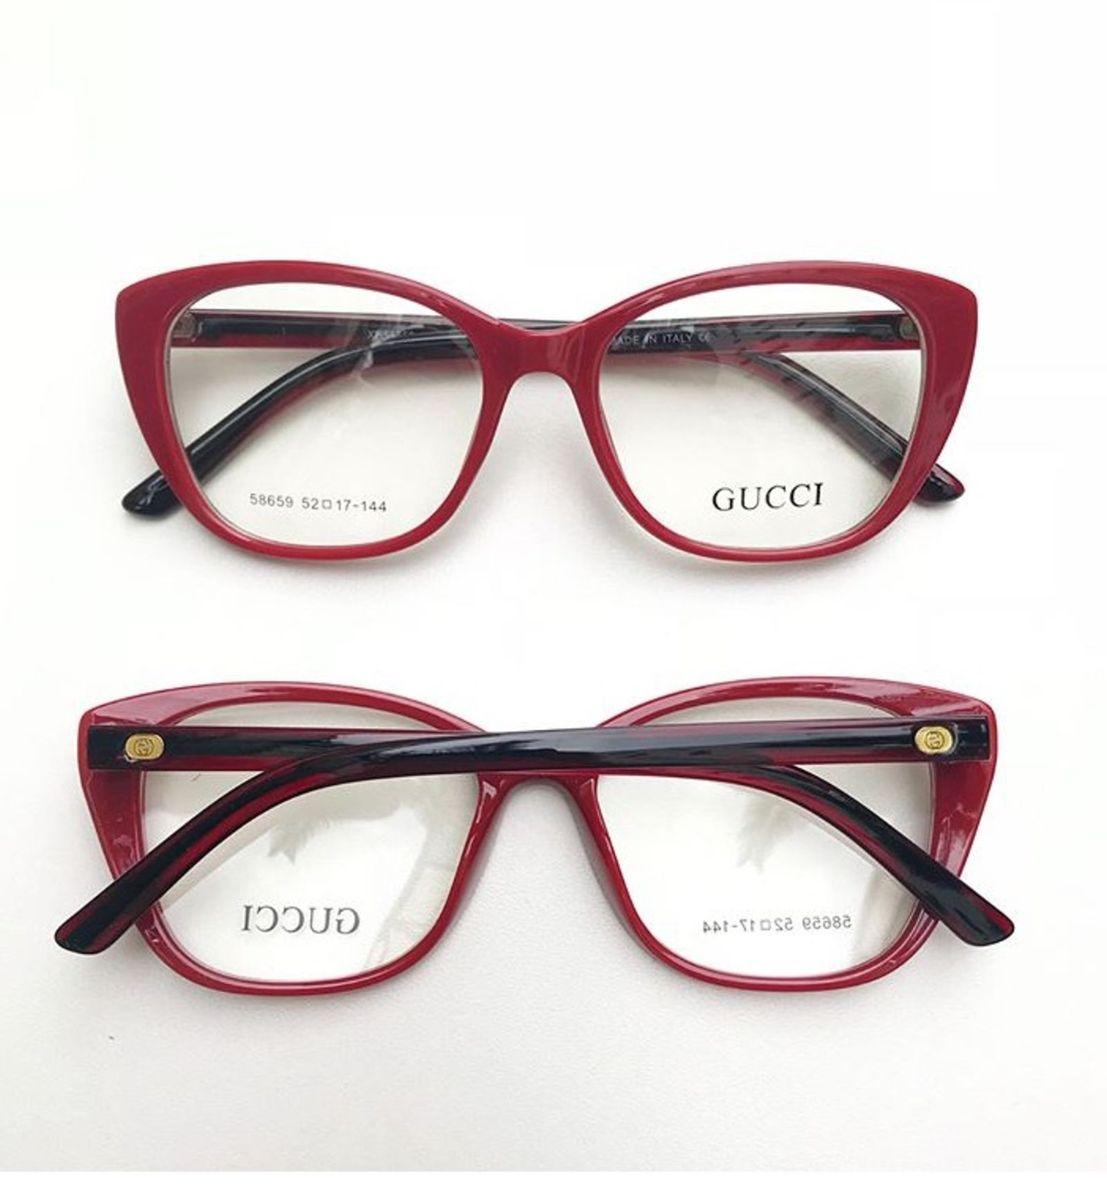 d9fc08f36c78c armação vermelha acetato - óculos sem marca.  Czm6ly9wag90b3muzw5qb2vplmnvbs5ici9wcm9kdwn0cy81ndgwnja2l2myotlhzdm0nwy4ymjmzdvkngy3y2ywnwmxnjbjzjlklmpwzw  ...